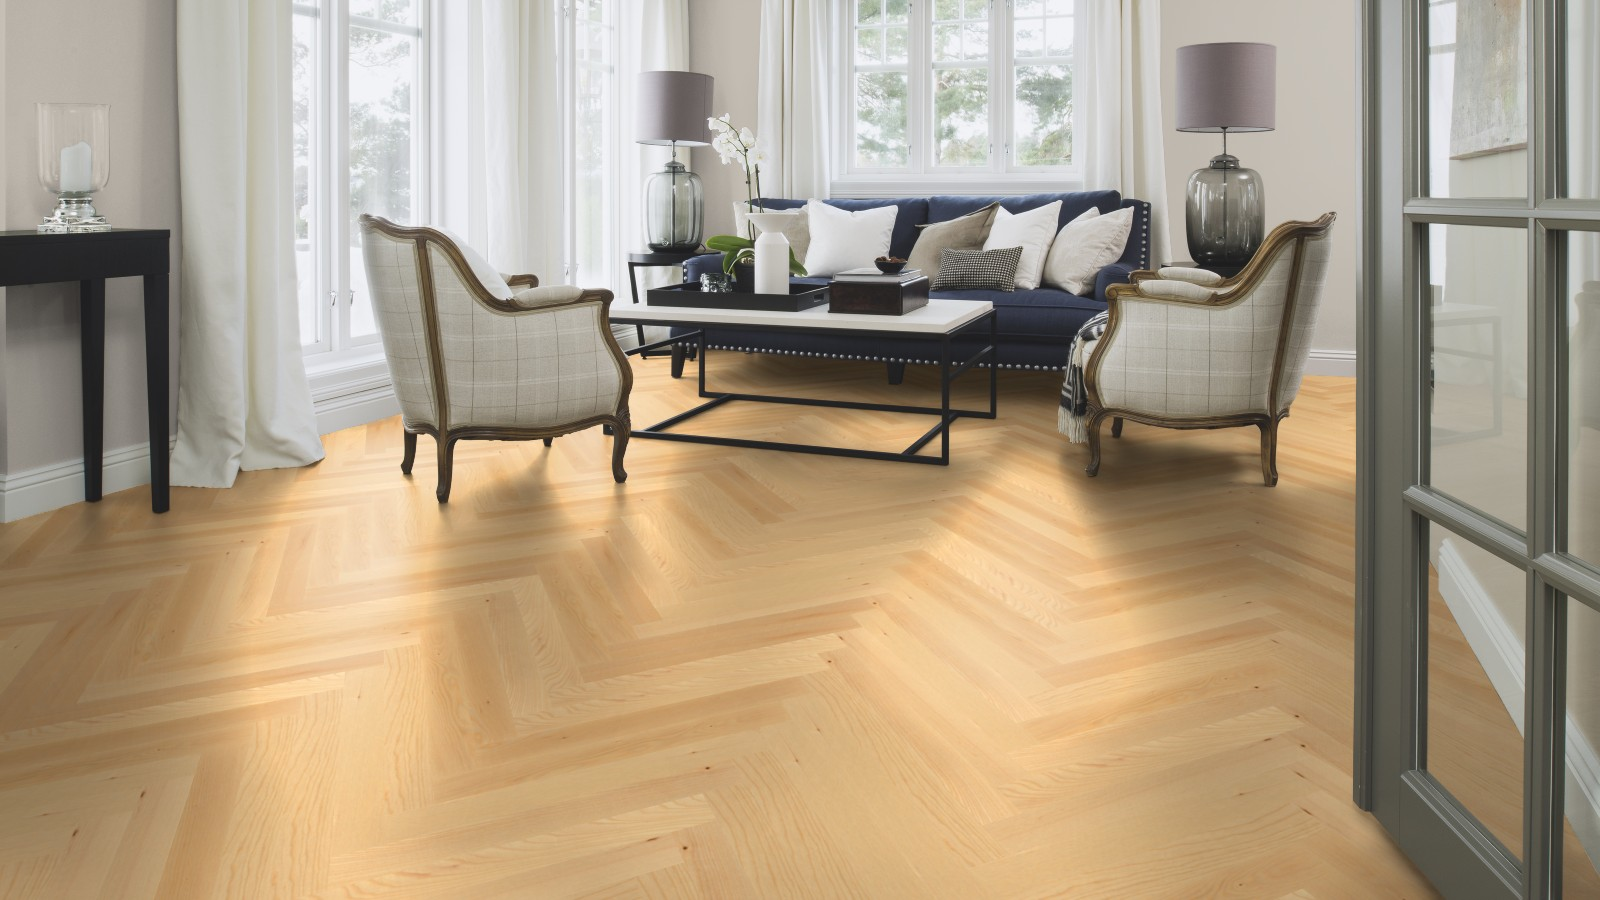 asn23k5d boen parkett stab prestige 10 mm esche natur live natural ge lt. Black Bedroom Furniture Sets. Home Design Ideas